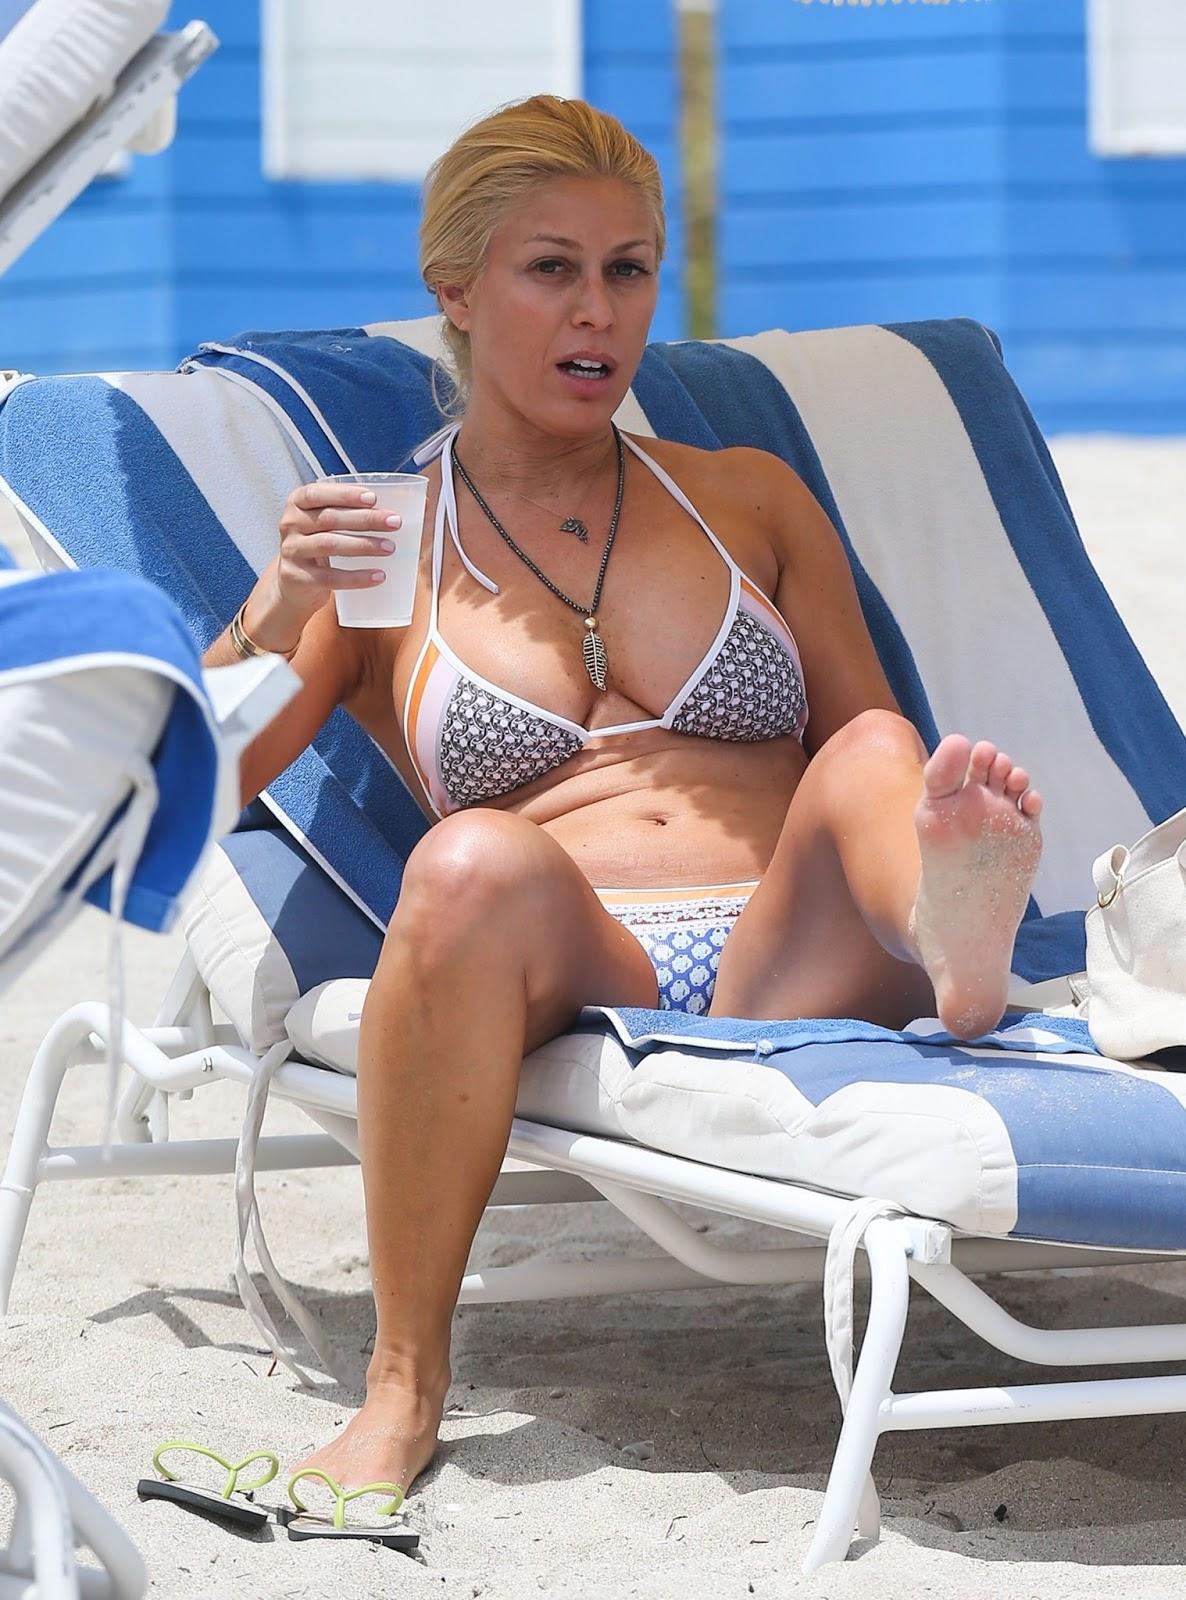 Hot woman boobs nude salma hayek